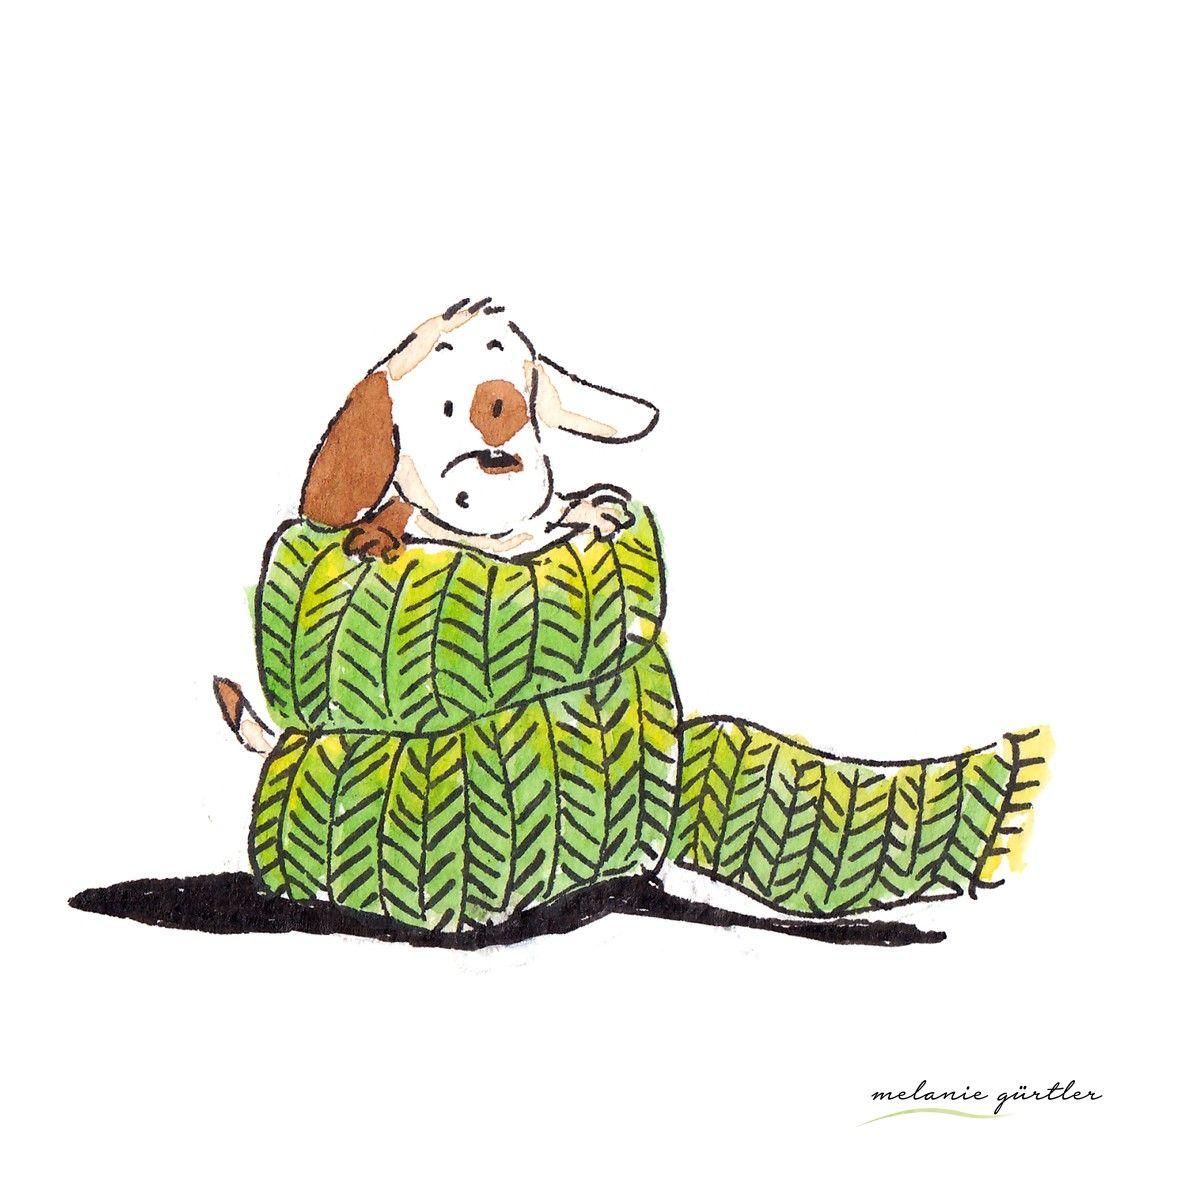 Kleiner Hund Melanie Gurtler Illustration Aquarell